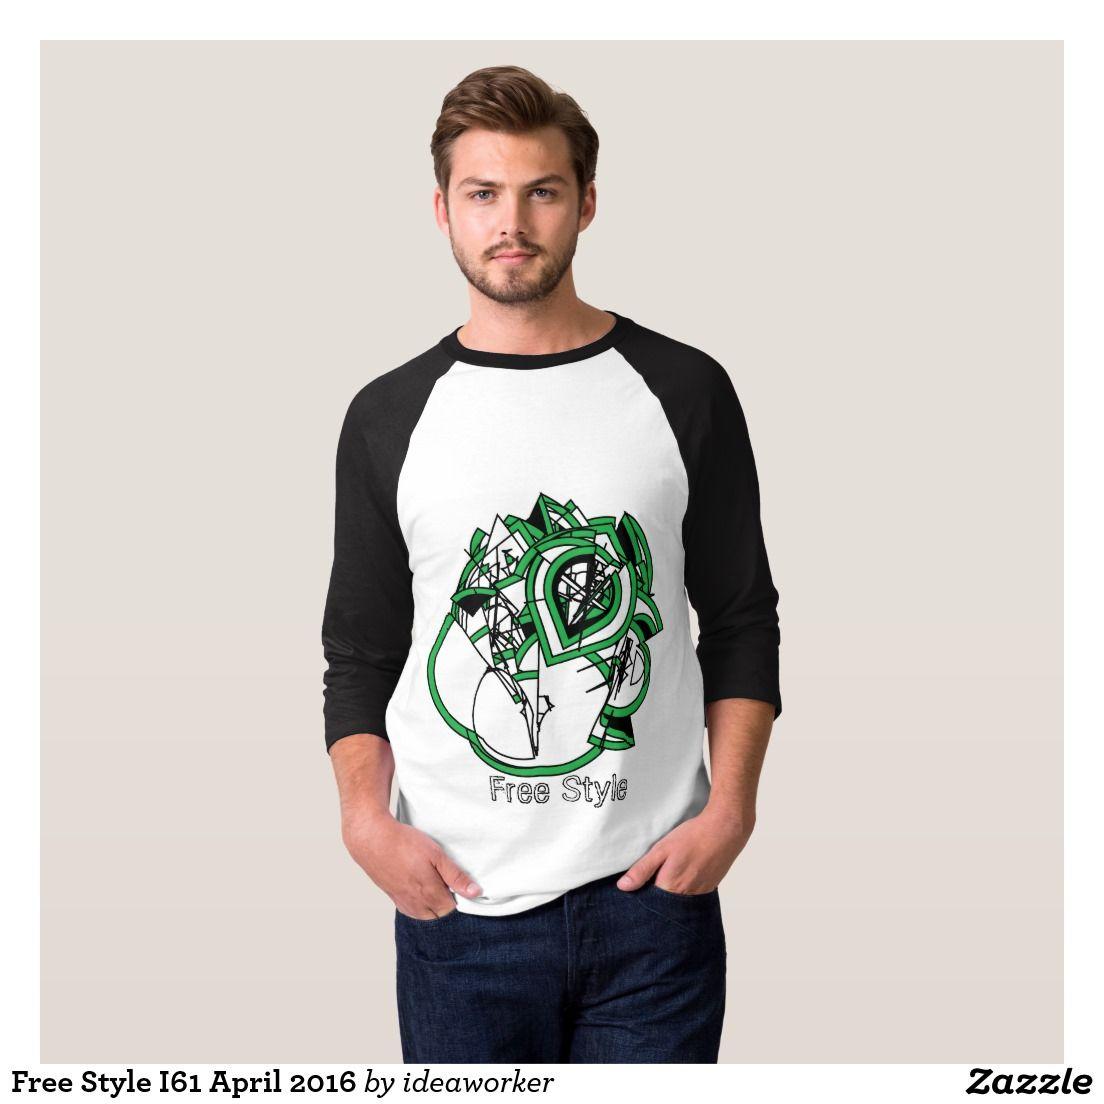 Free Style I61 Men's Basic 3/4 Sleeve Raglan T-Shirt (Color: White/Black)   #design #fashion #freestyle #men #raglan #tshirt